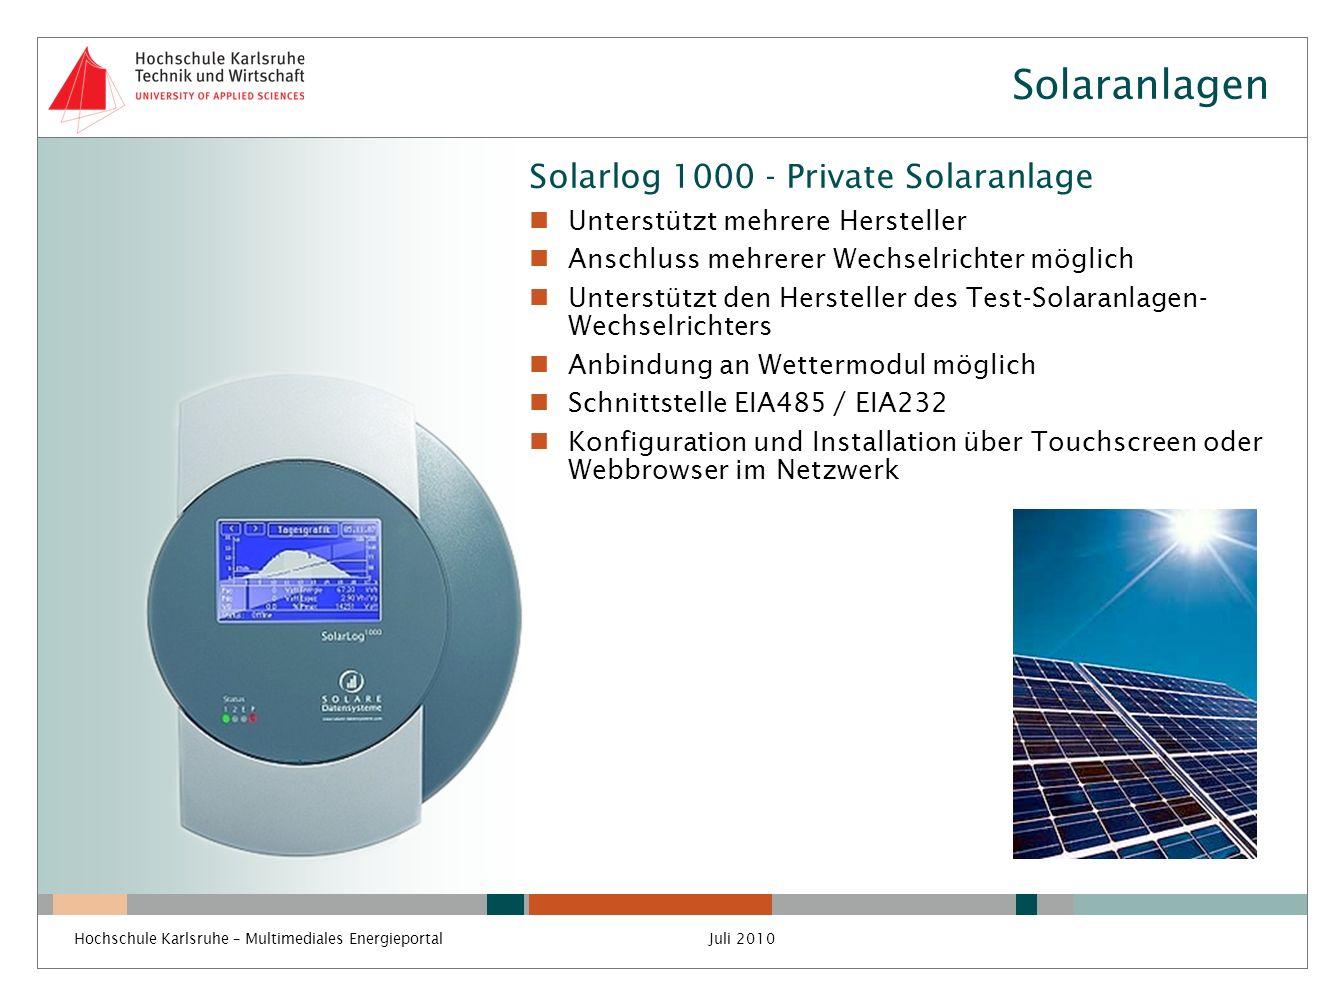 Solaranlagen Solarlog 1000 - Private Solaranlage